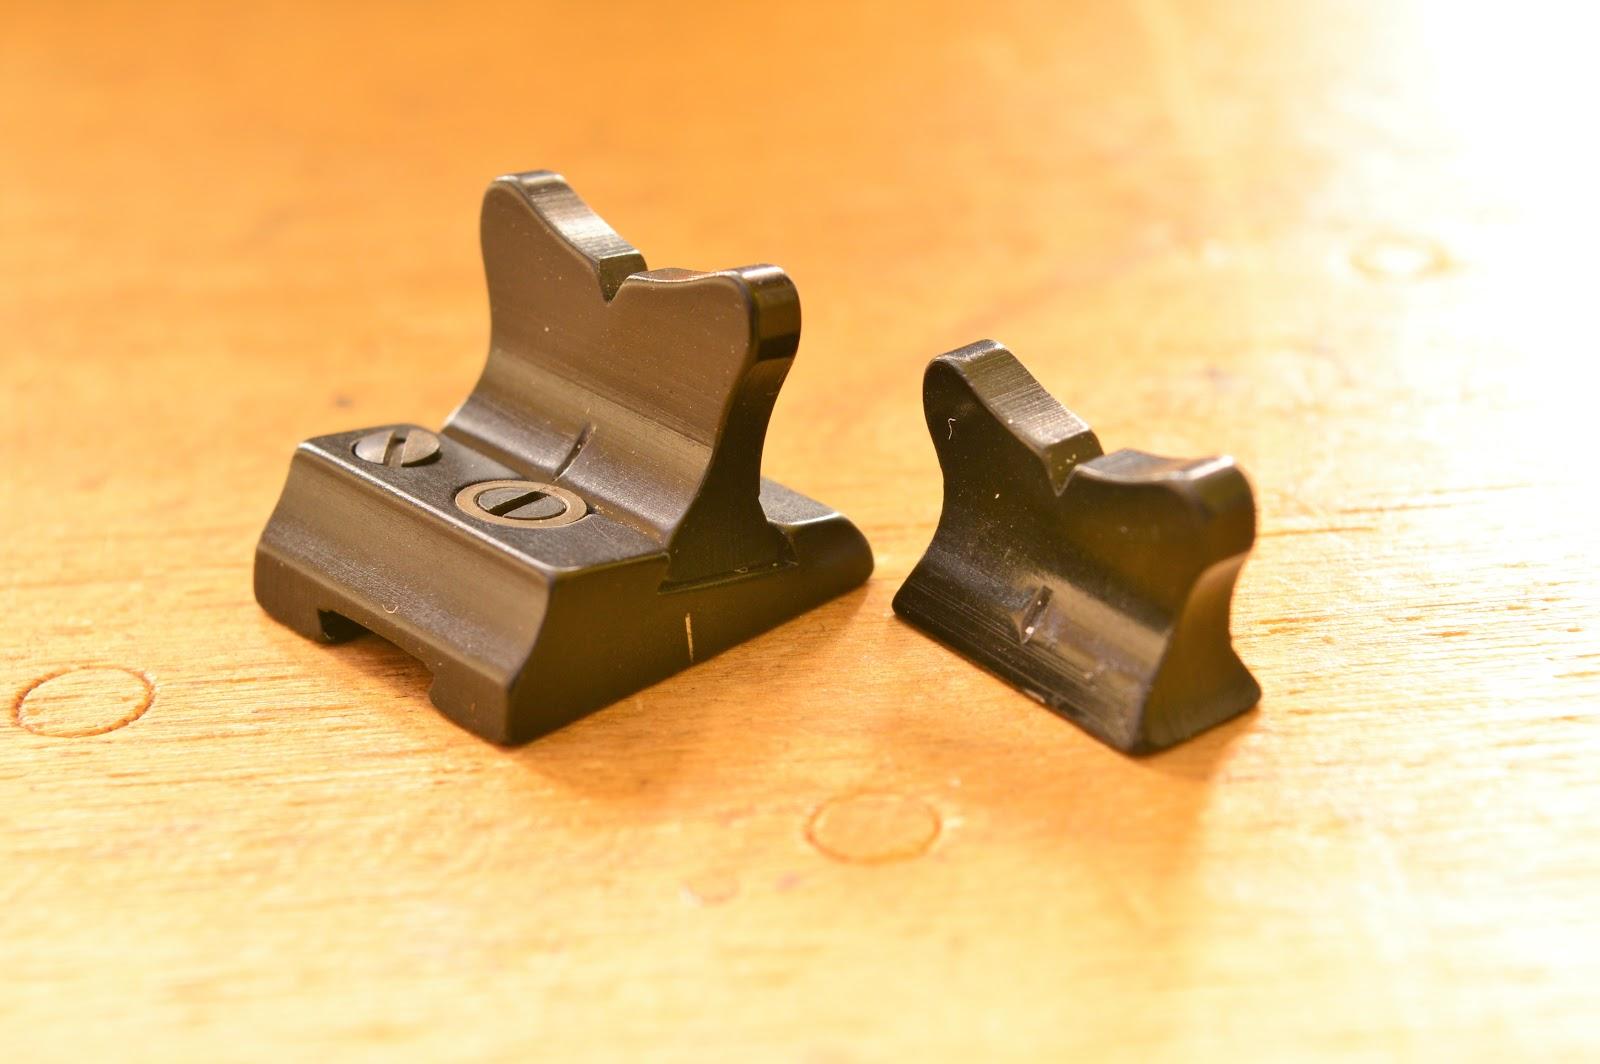 blades for the BSA Stutzen